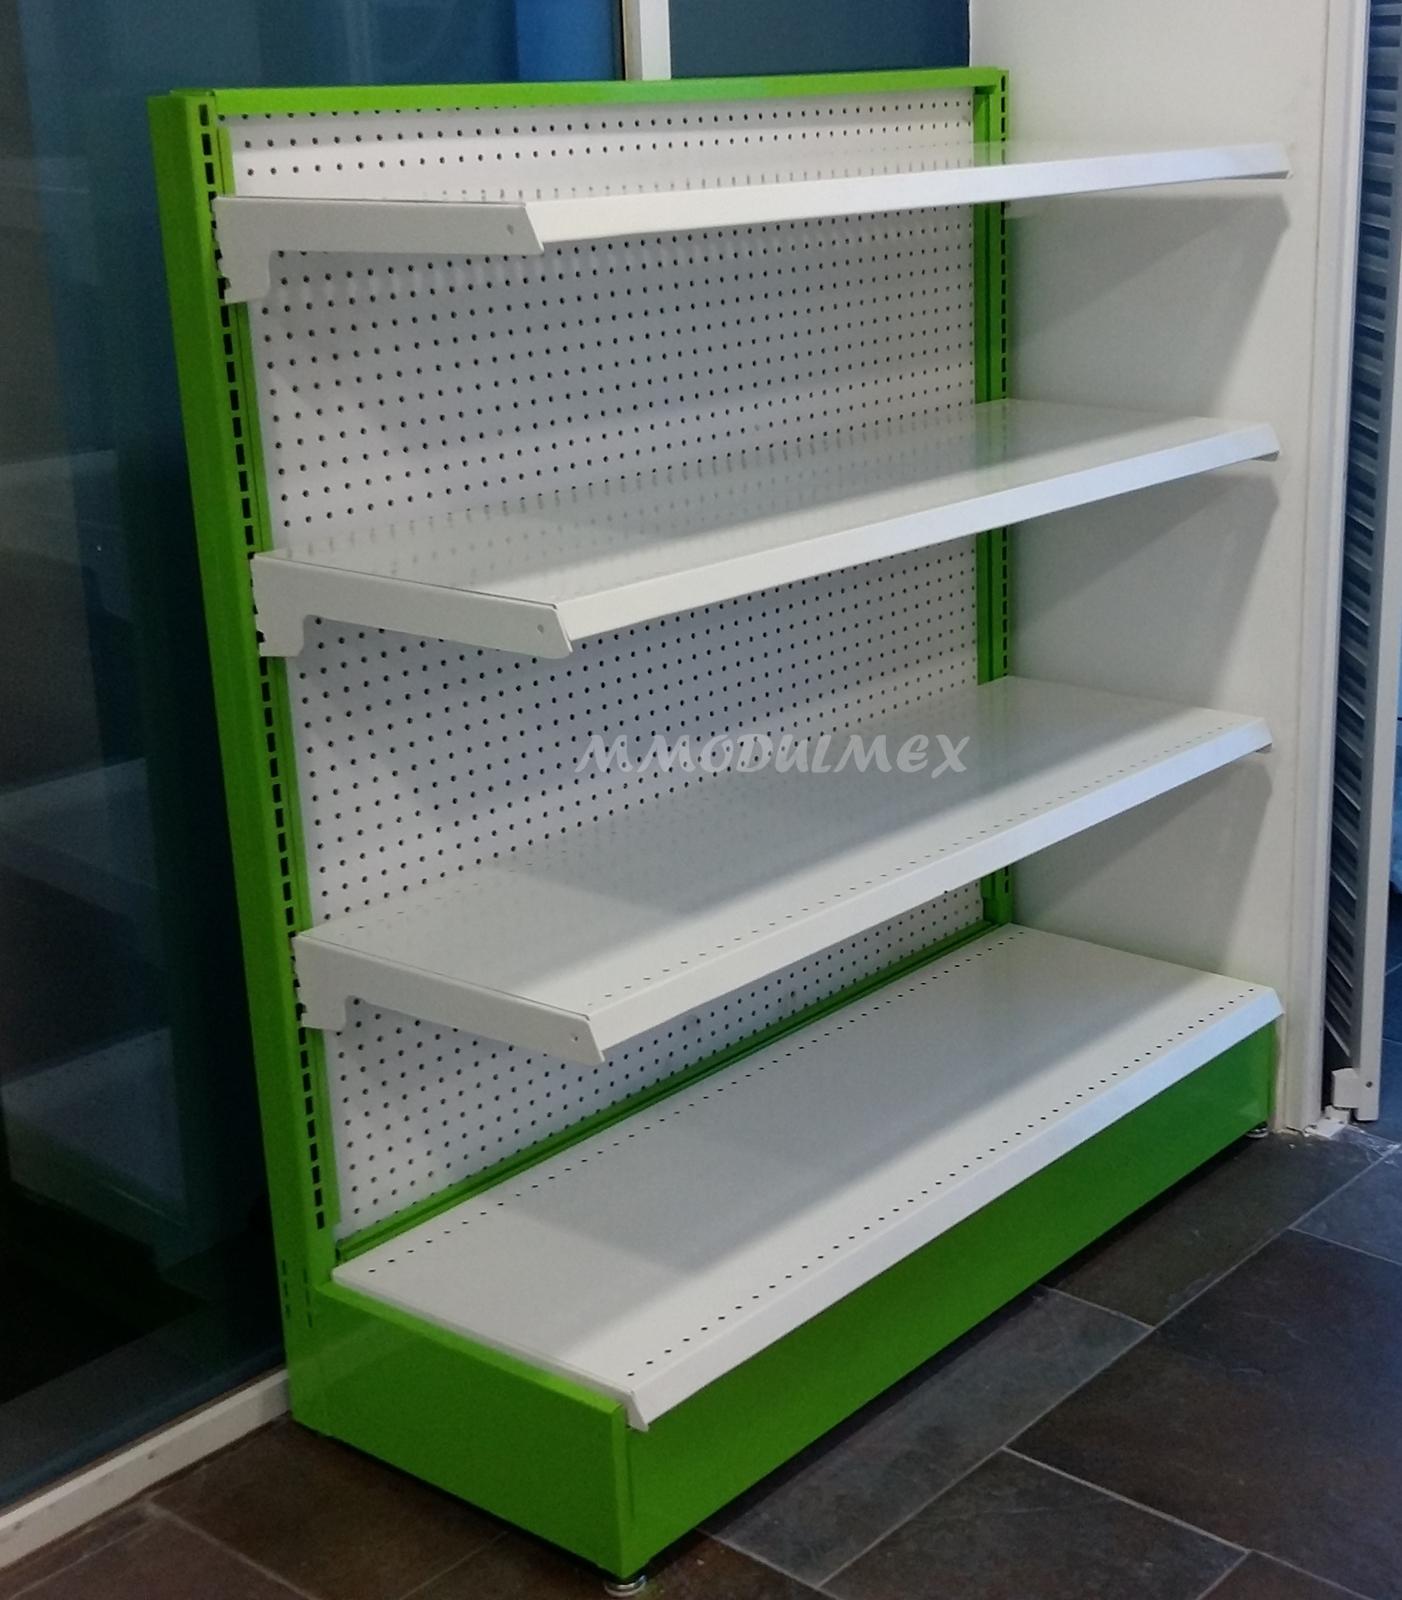 Mostradores vitrinas estantes estanter a anaqueles - Estantes para bodegas ...